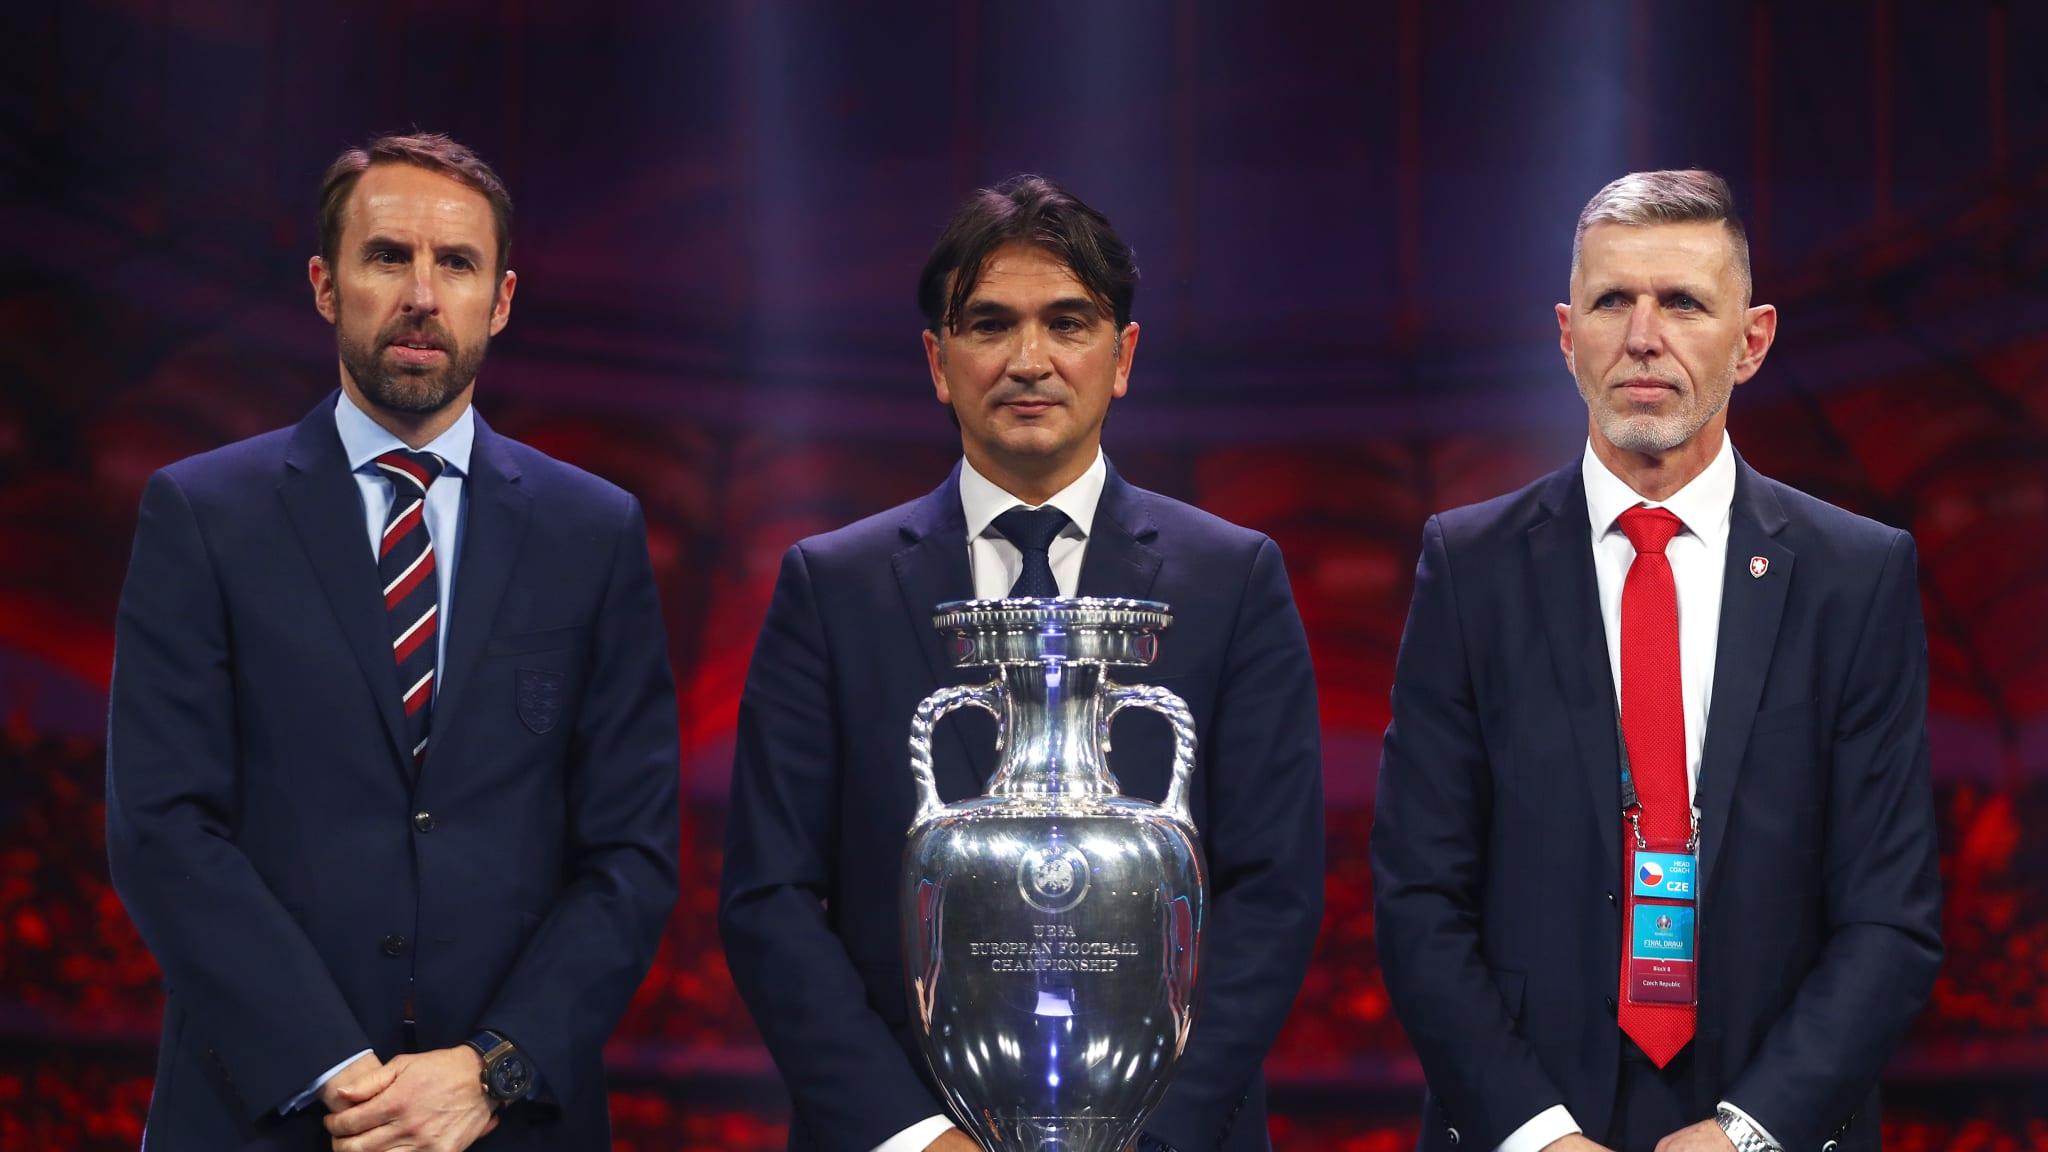 Gareth Southgate, Head Coach of England, Zlatko Dalic, Head Coach of Croatia, and Jaroslav Silhavy, Head Coach of Czech Republic pose